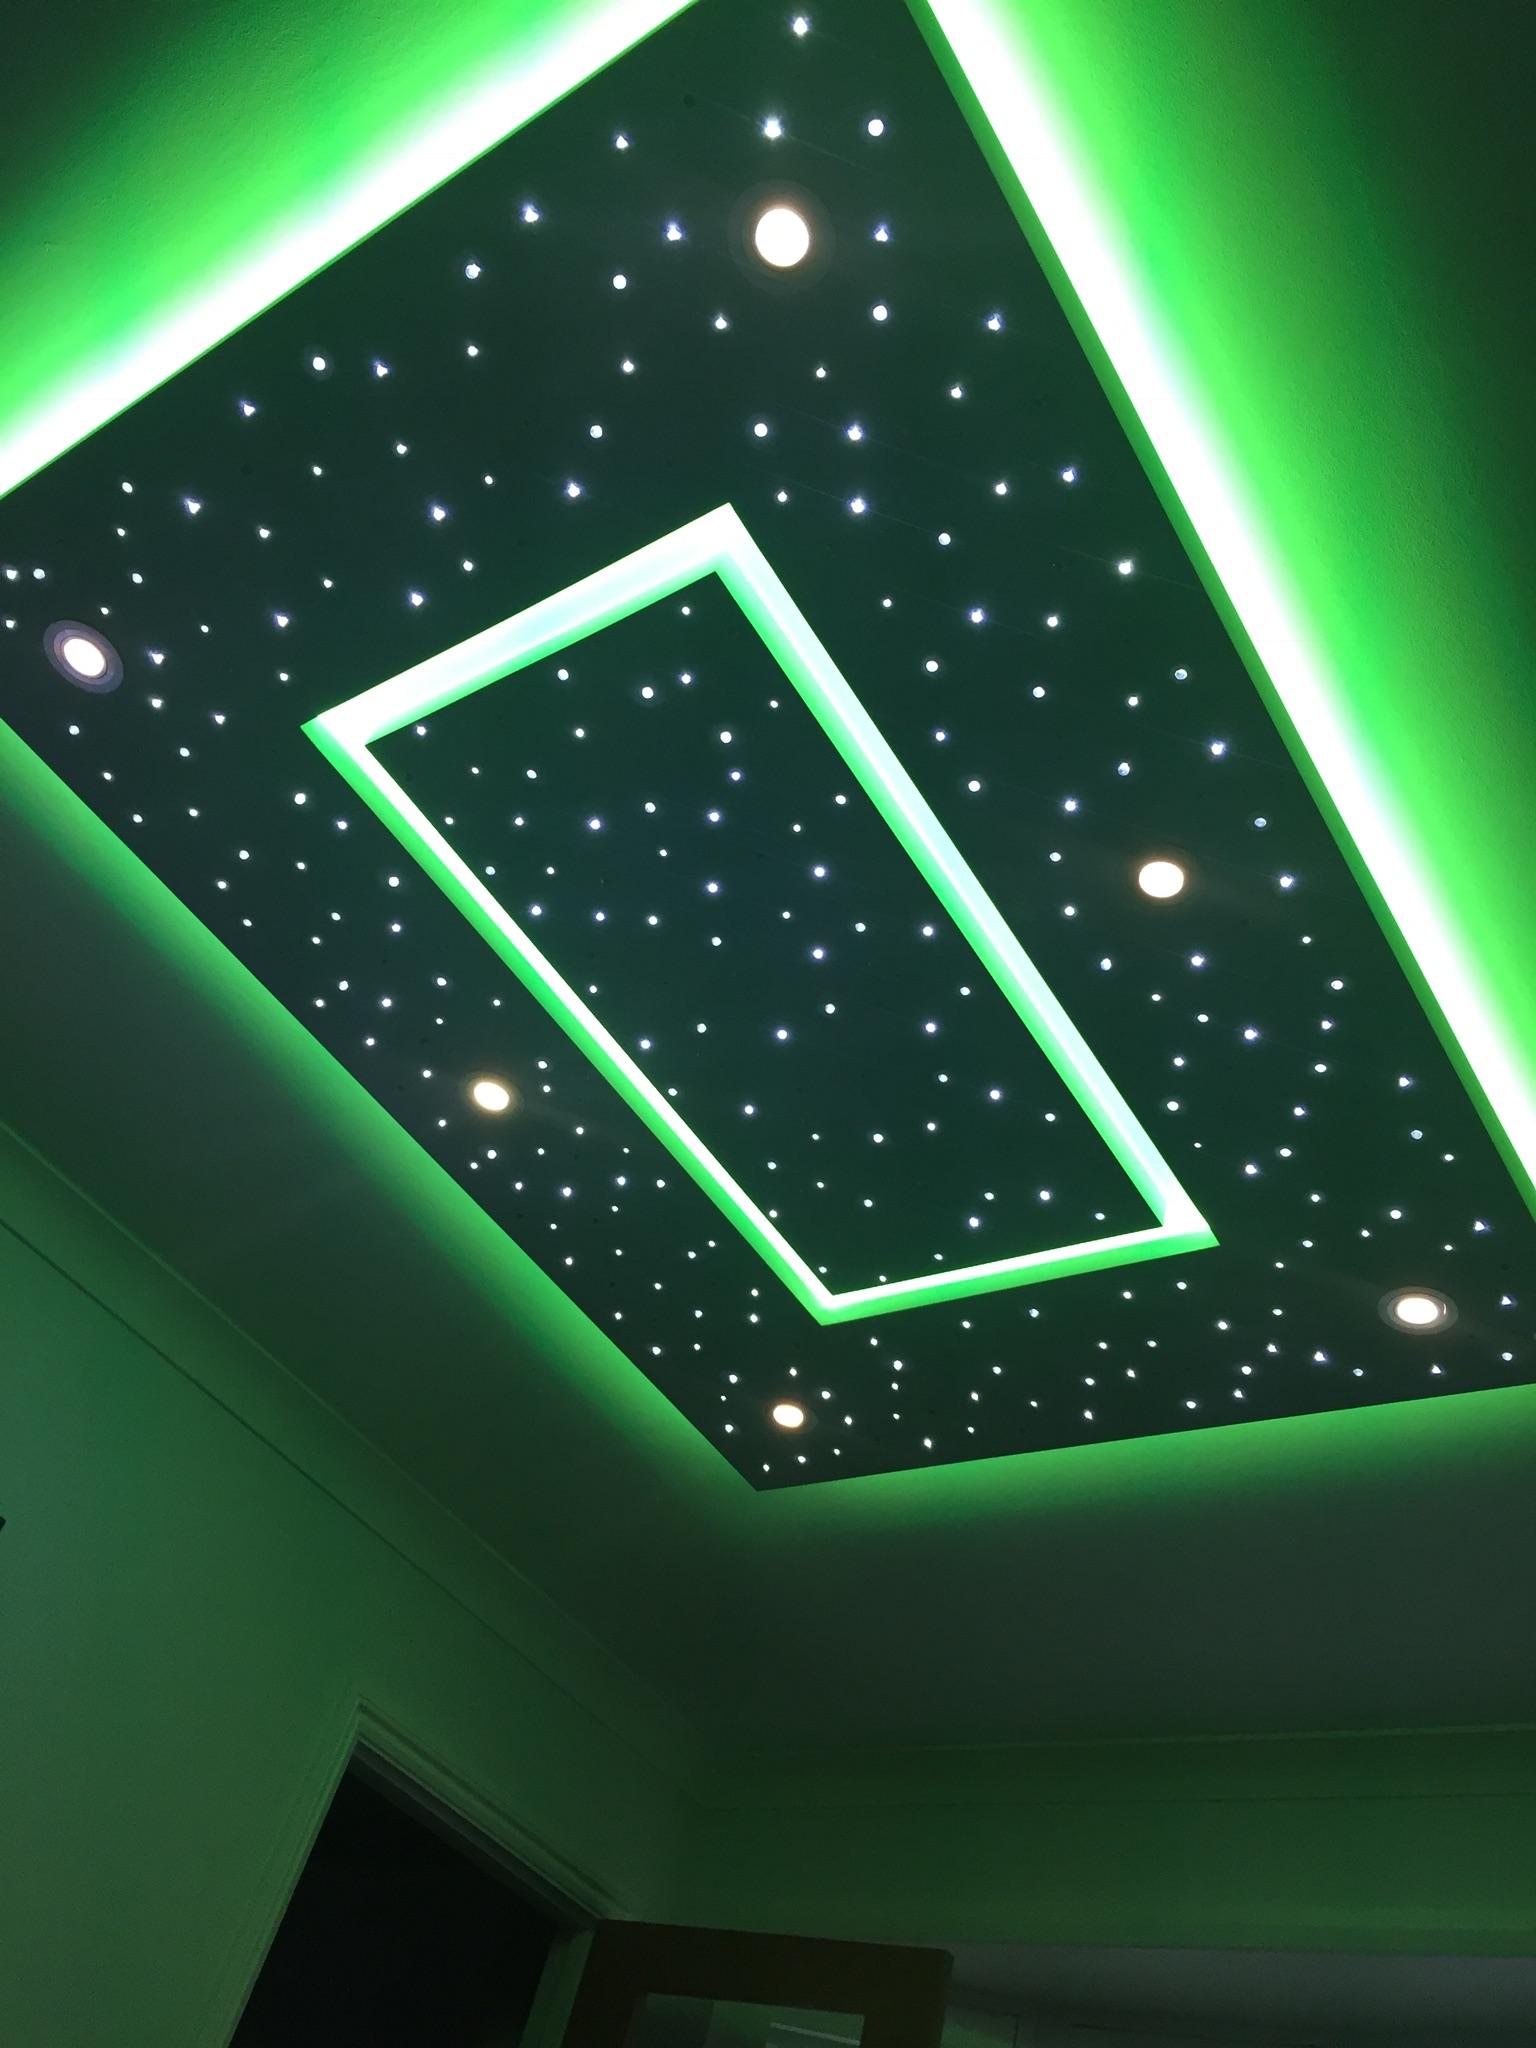 Star ceiling in Living room, edge lighting set to green